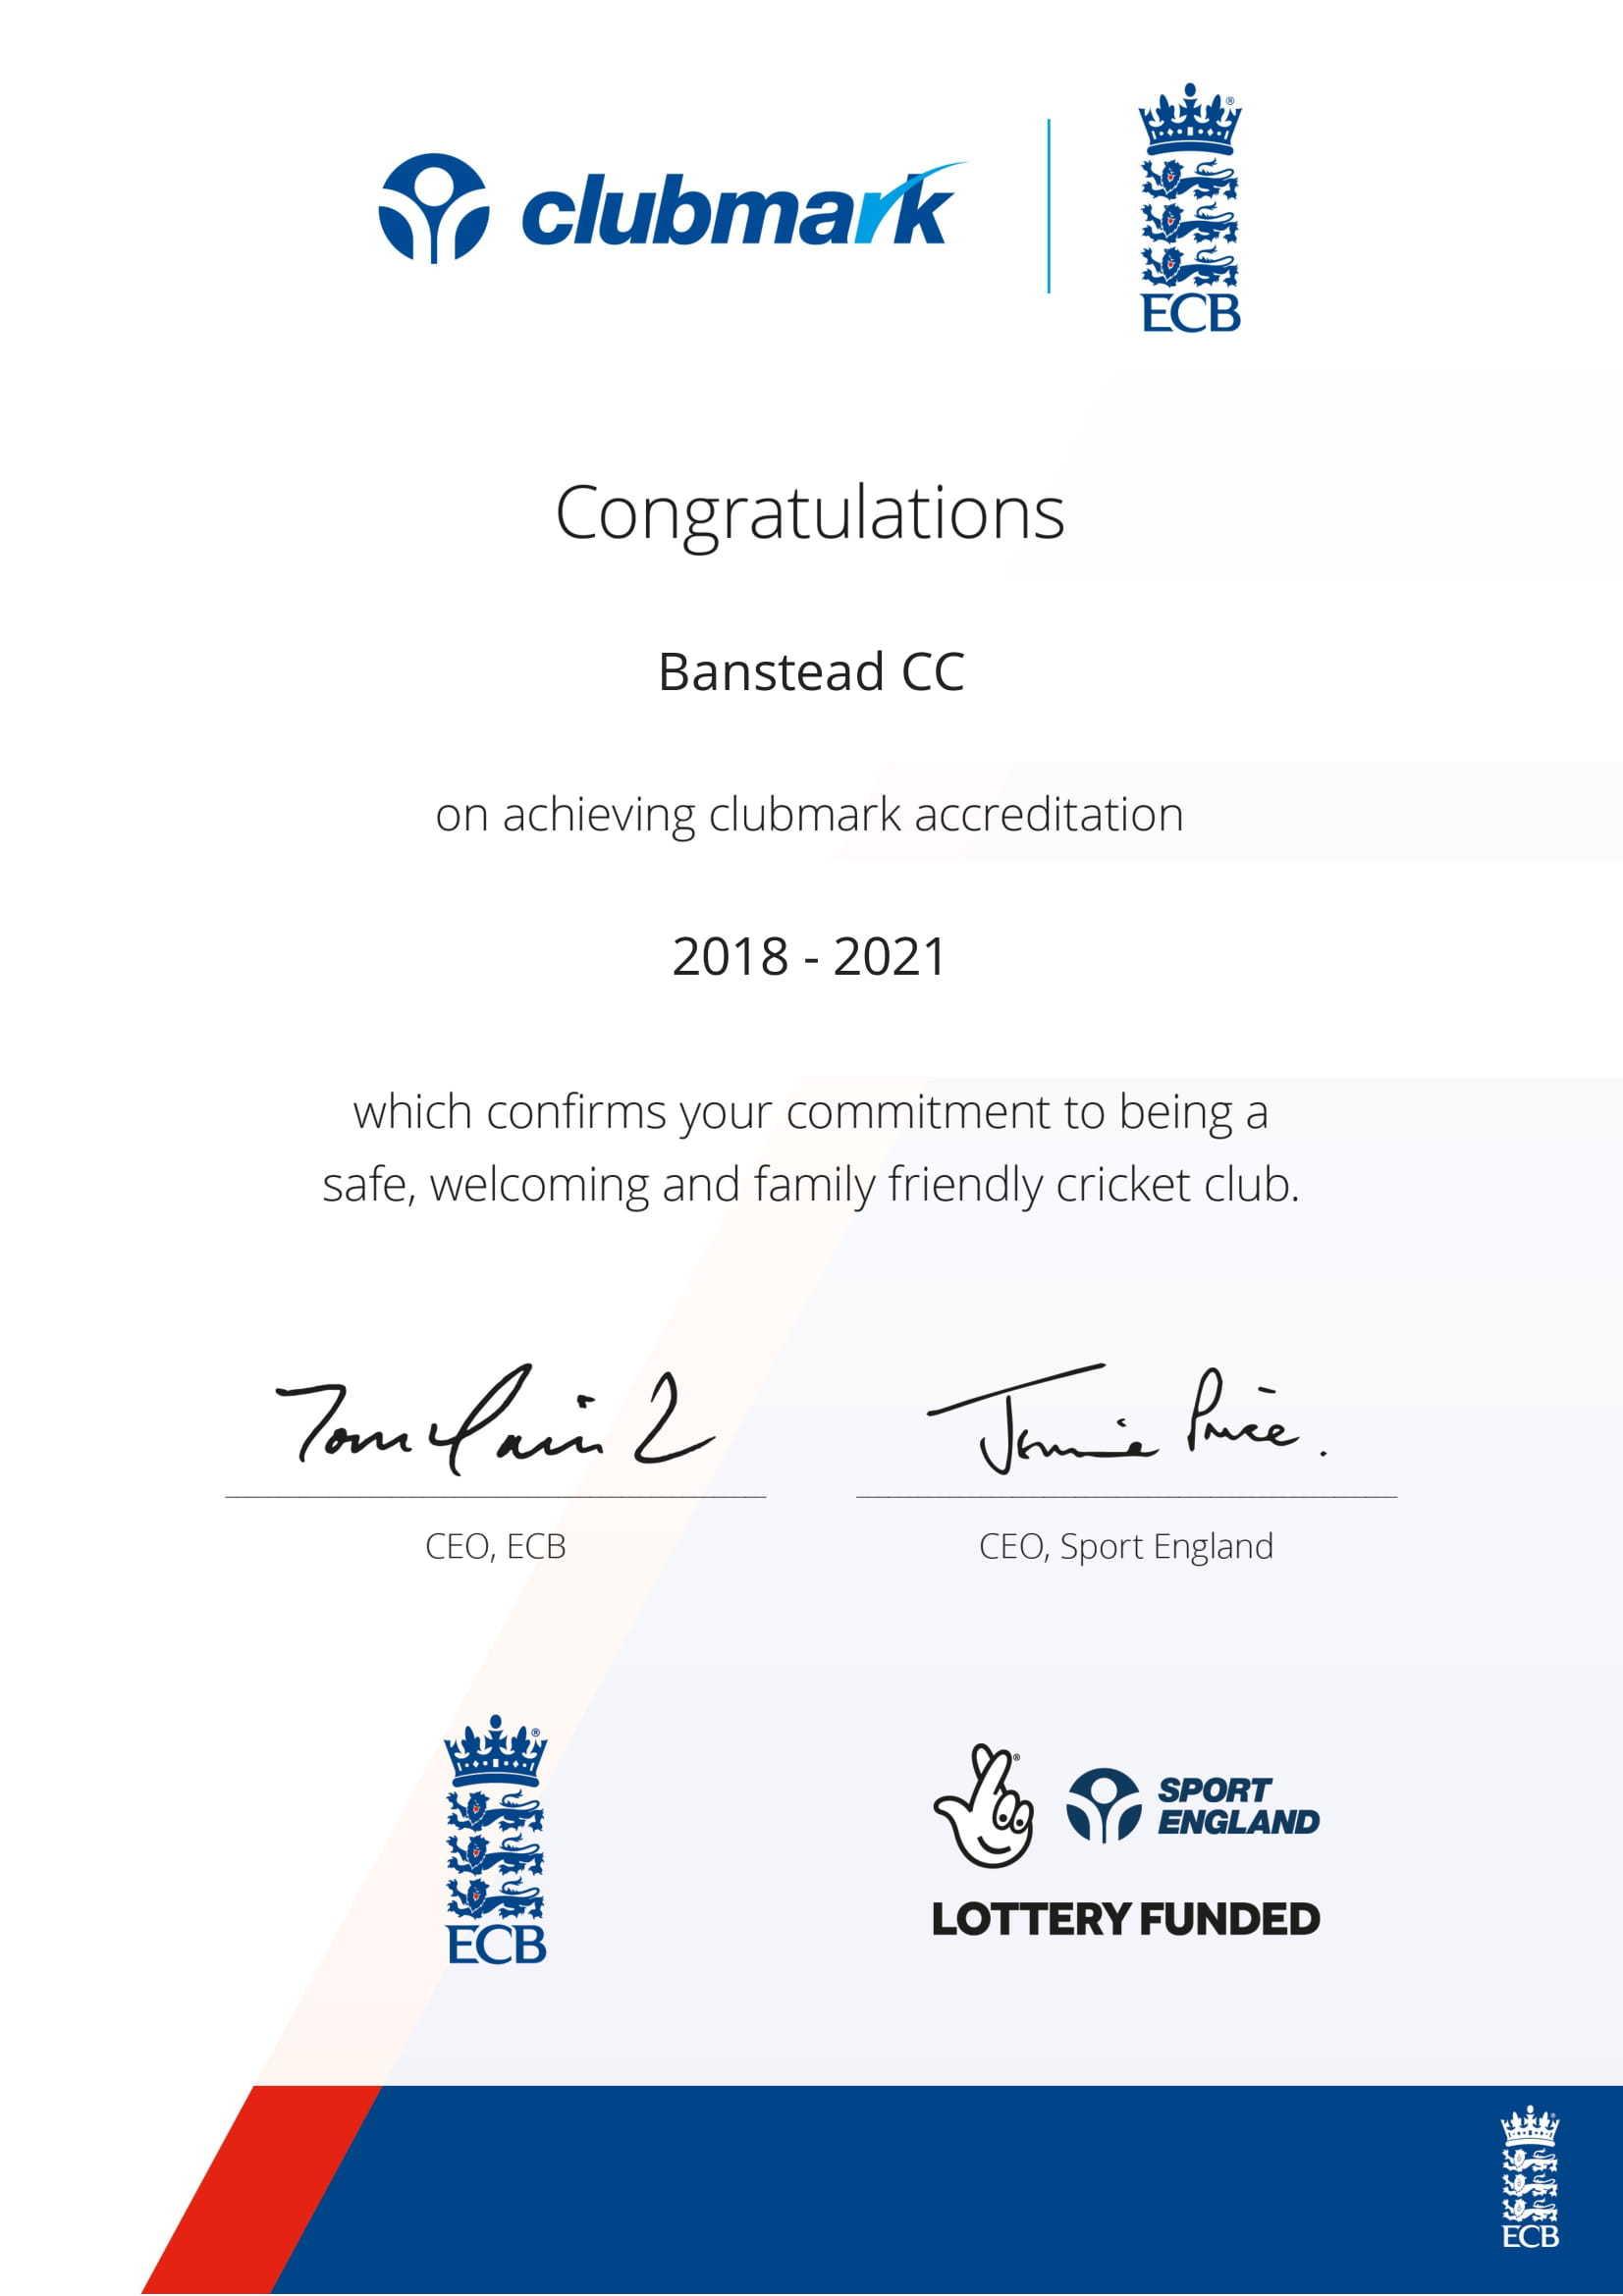 Banstead_CC_clubmark_certificate__1_-1